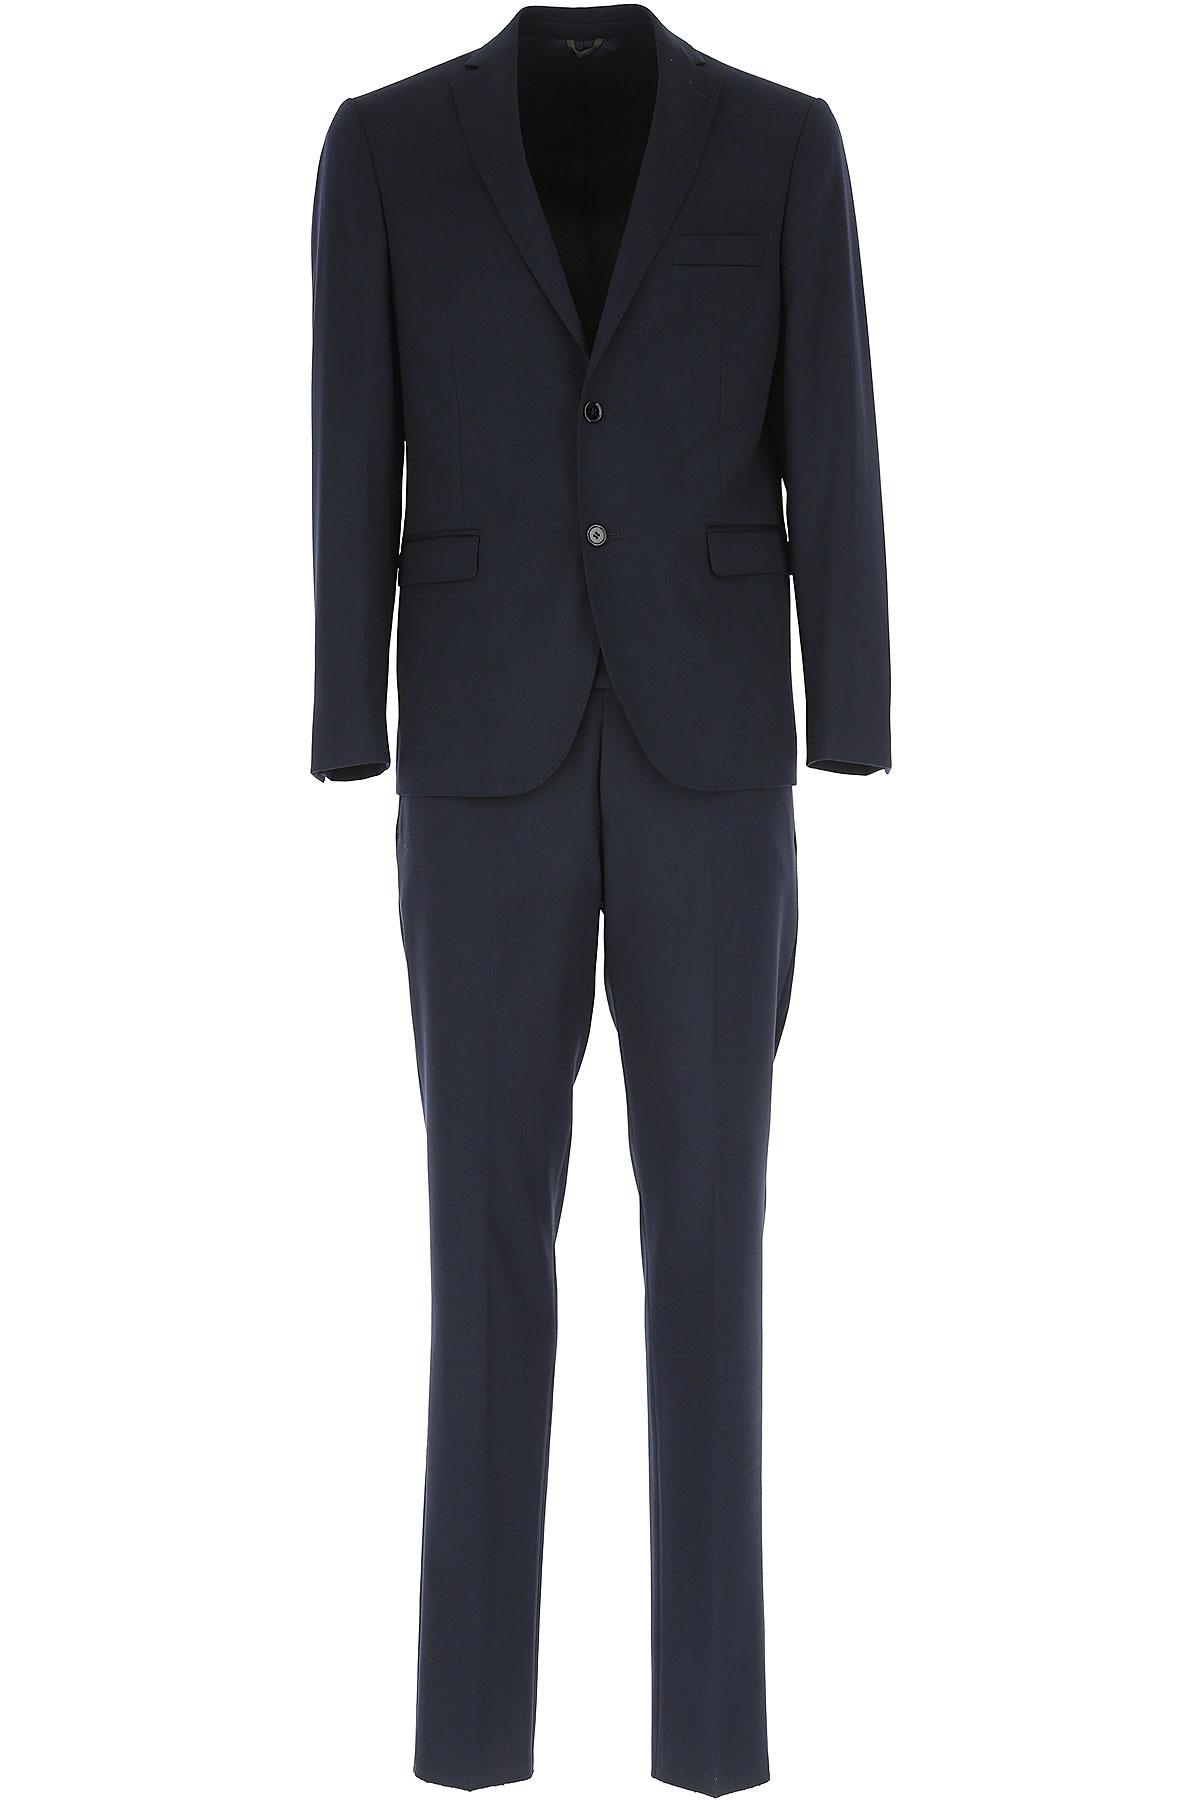 Simbols Men's Suit, Dark Blue, polyamide, 2019, L XL XXL XXXL